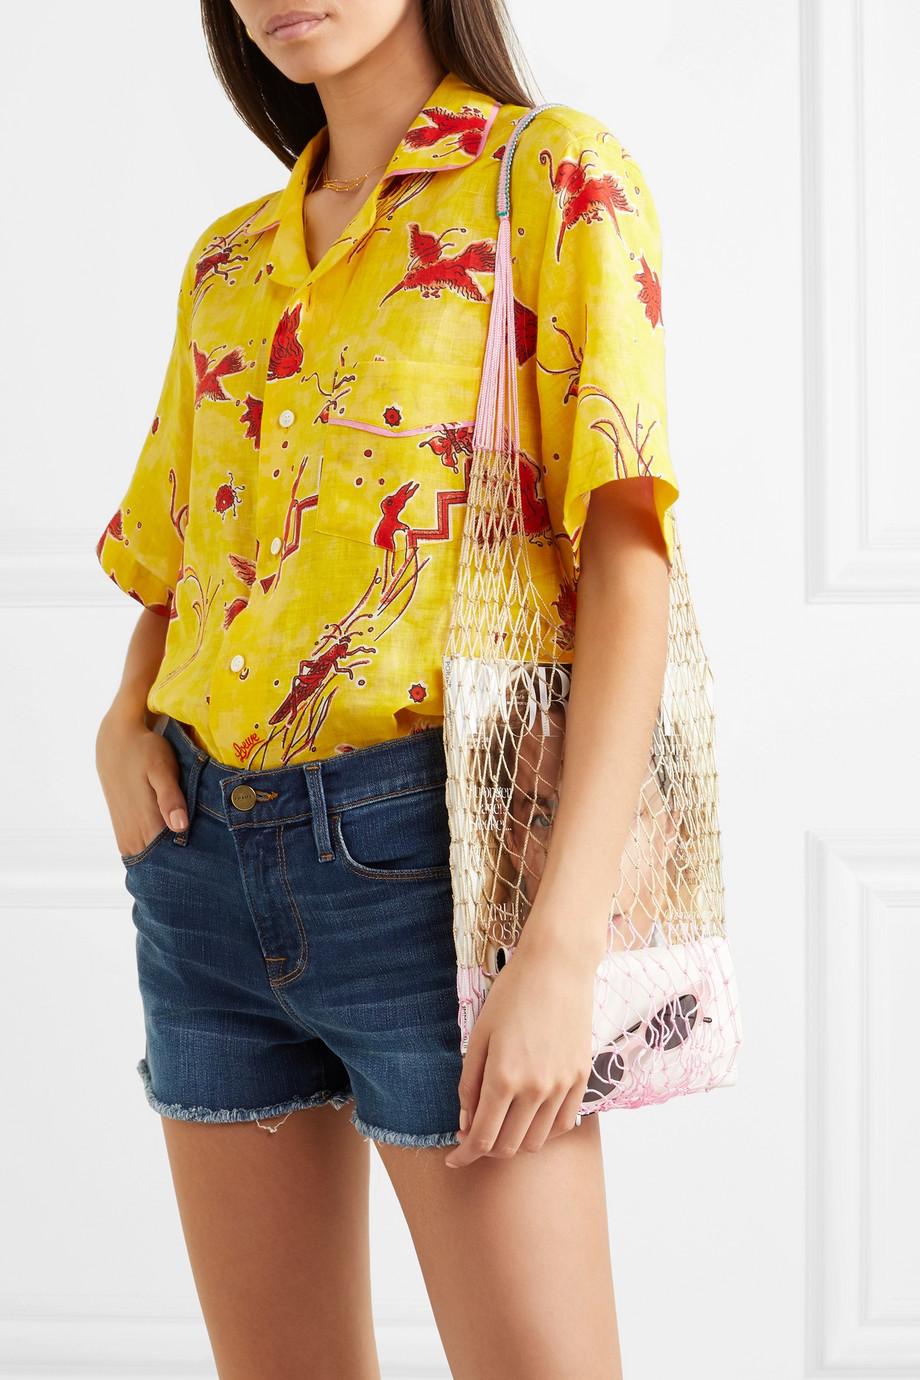 Sophie Anderson Macramé shoulder bag $255